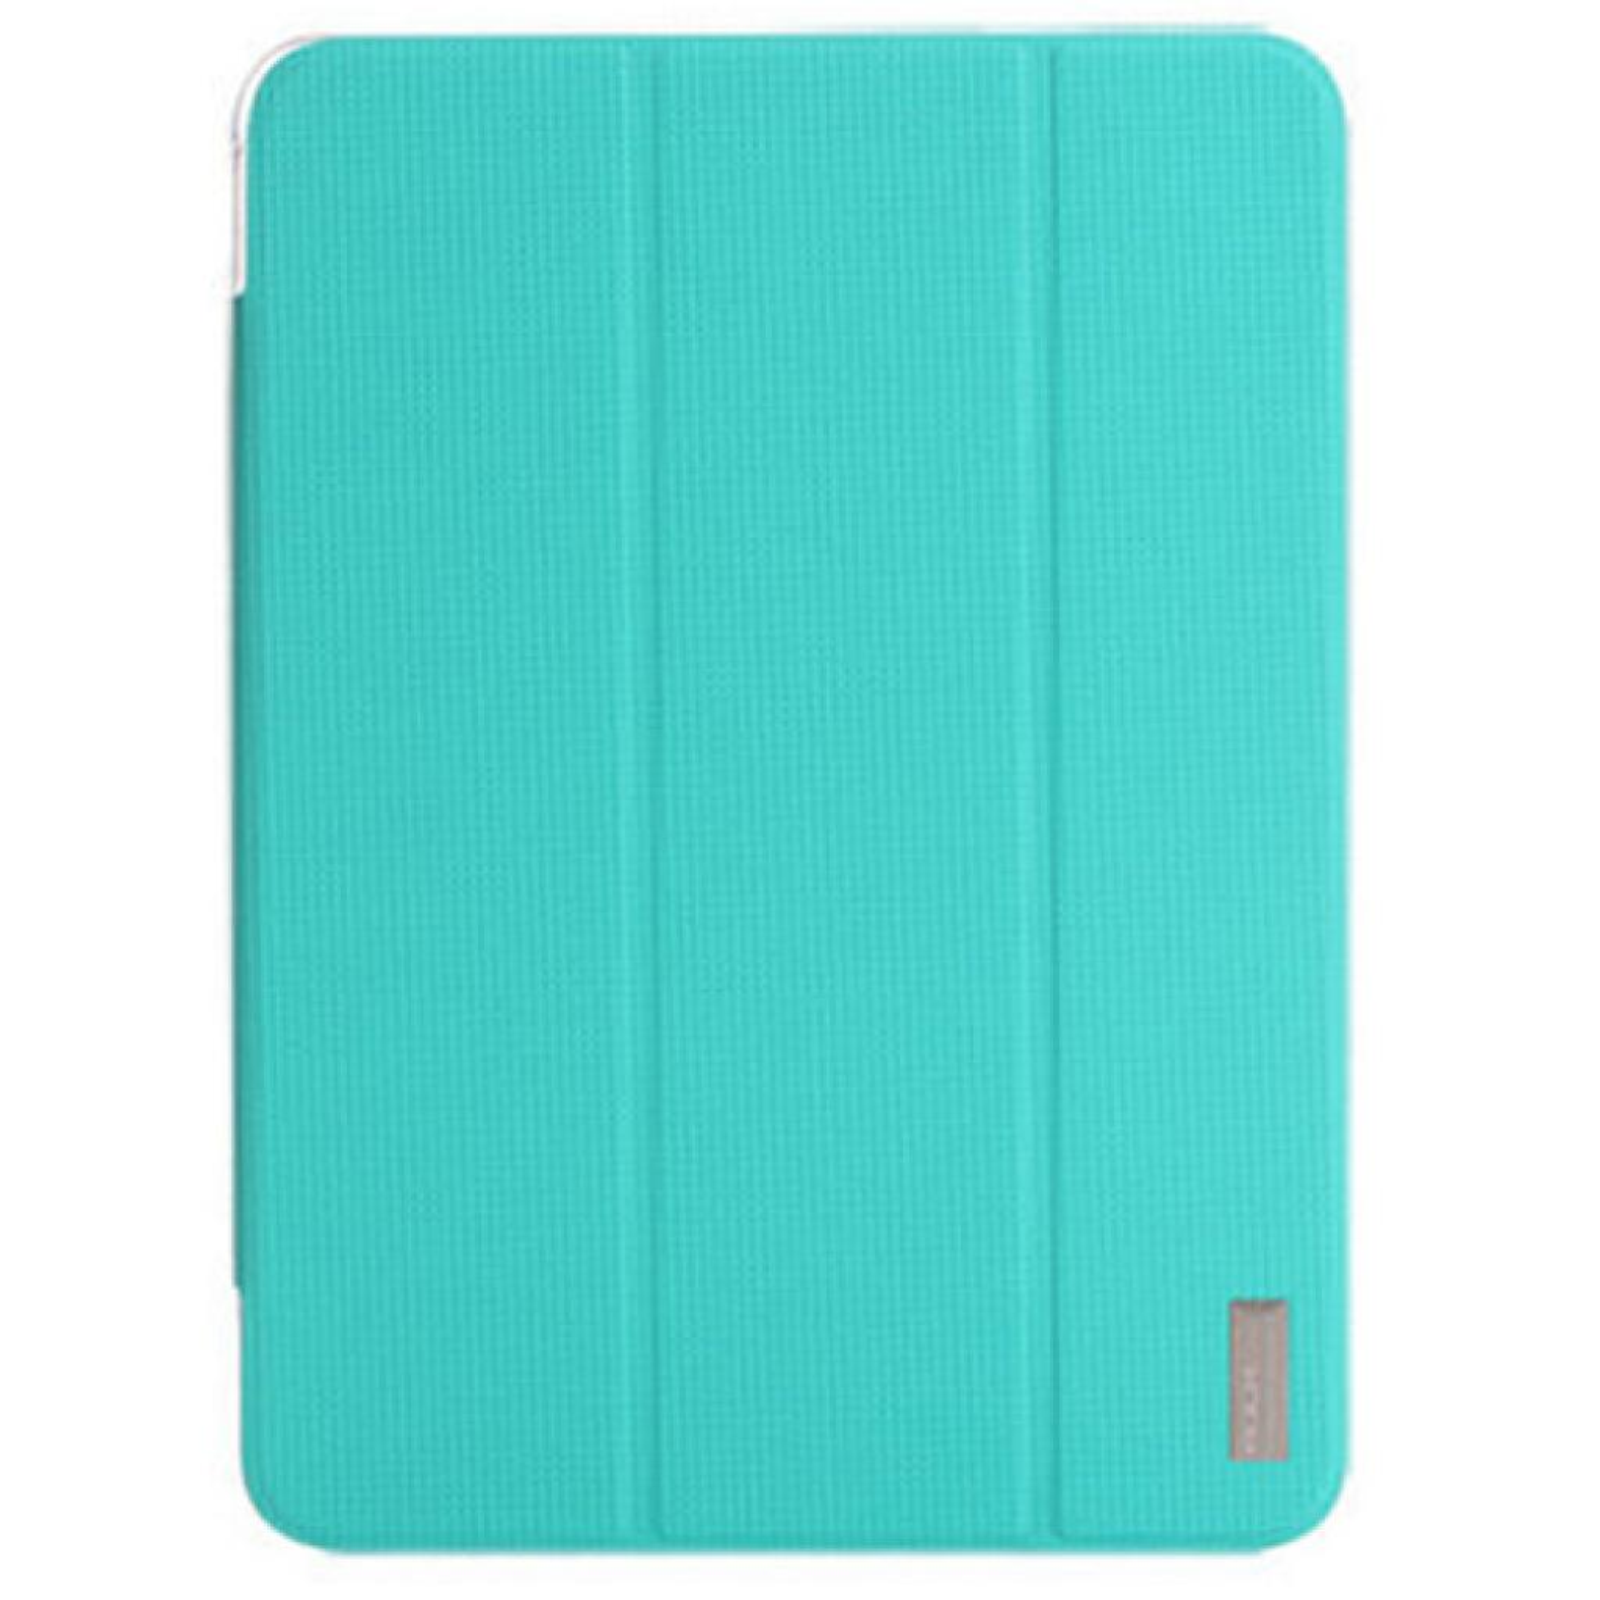 Чехол для планшета Rock Samsung Galaxy Tab 4 10.1 New elegant series azure (Tab 4 10.1-65462)